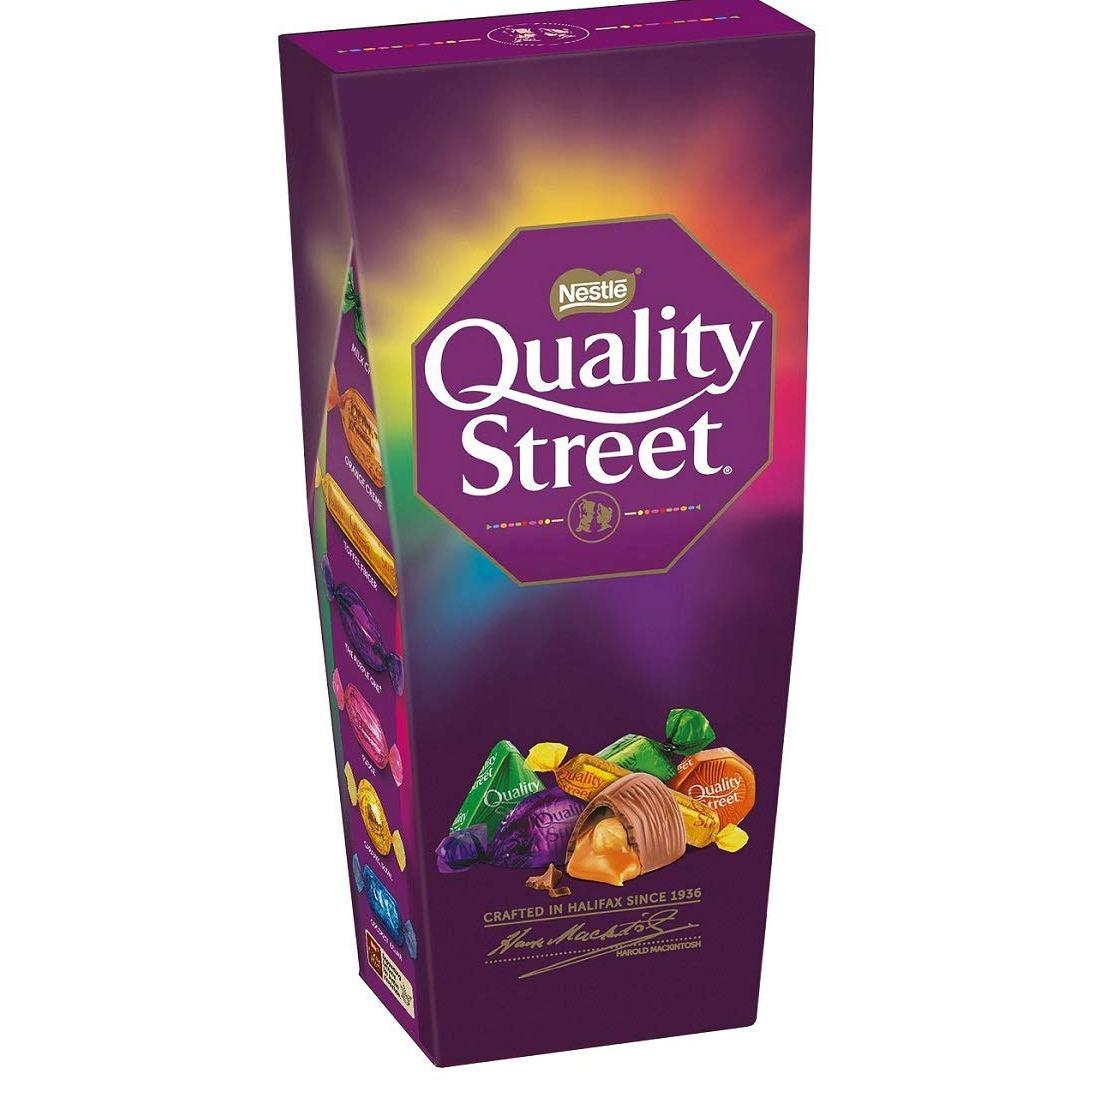 Nestlé UK Quality Street Chocolate & Toffee Carton 240g